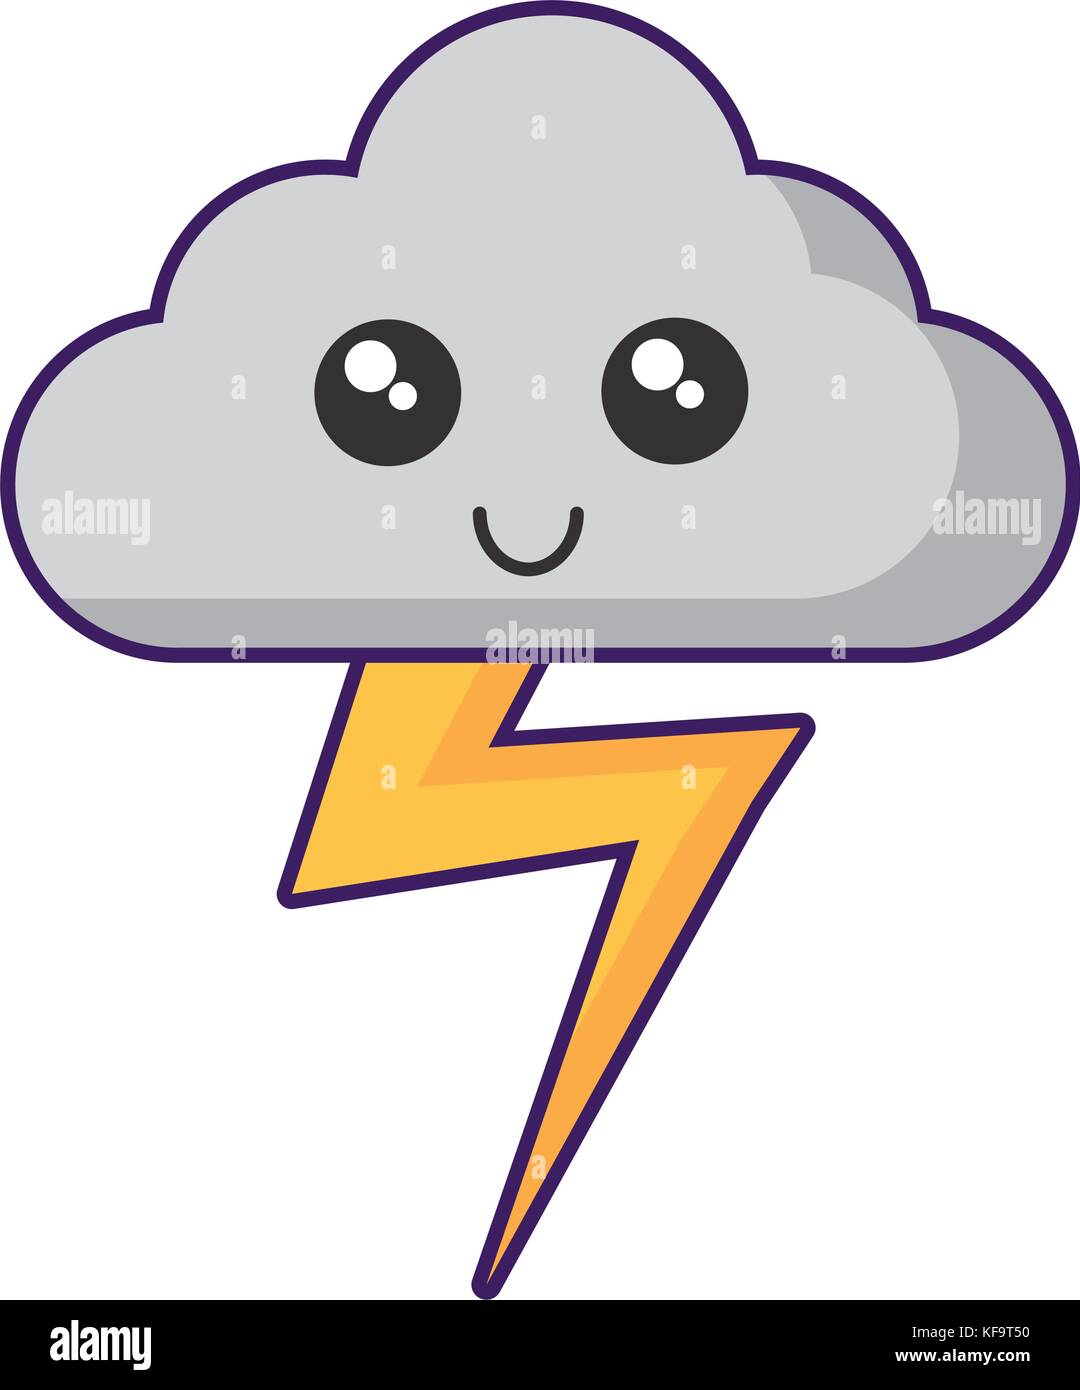 Nuage kawaii et thunder icône sur fond blanc vector illustration Photo Stock